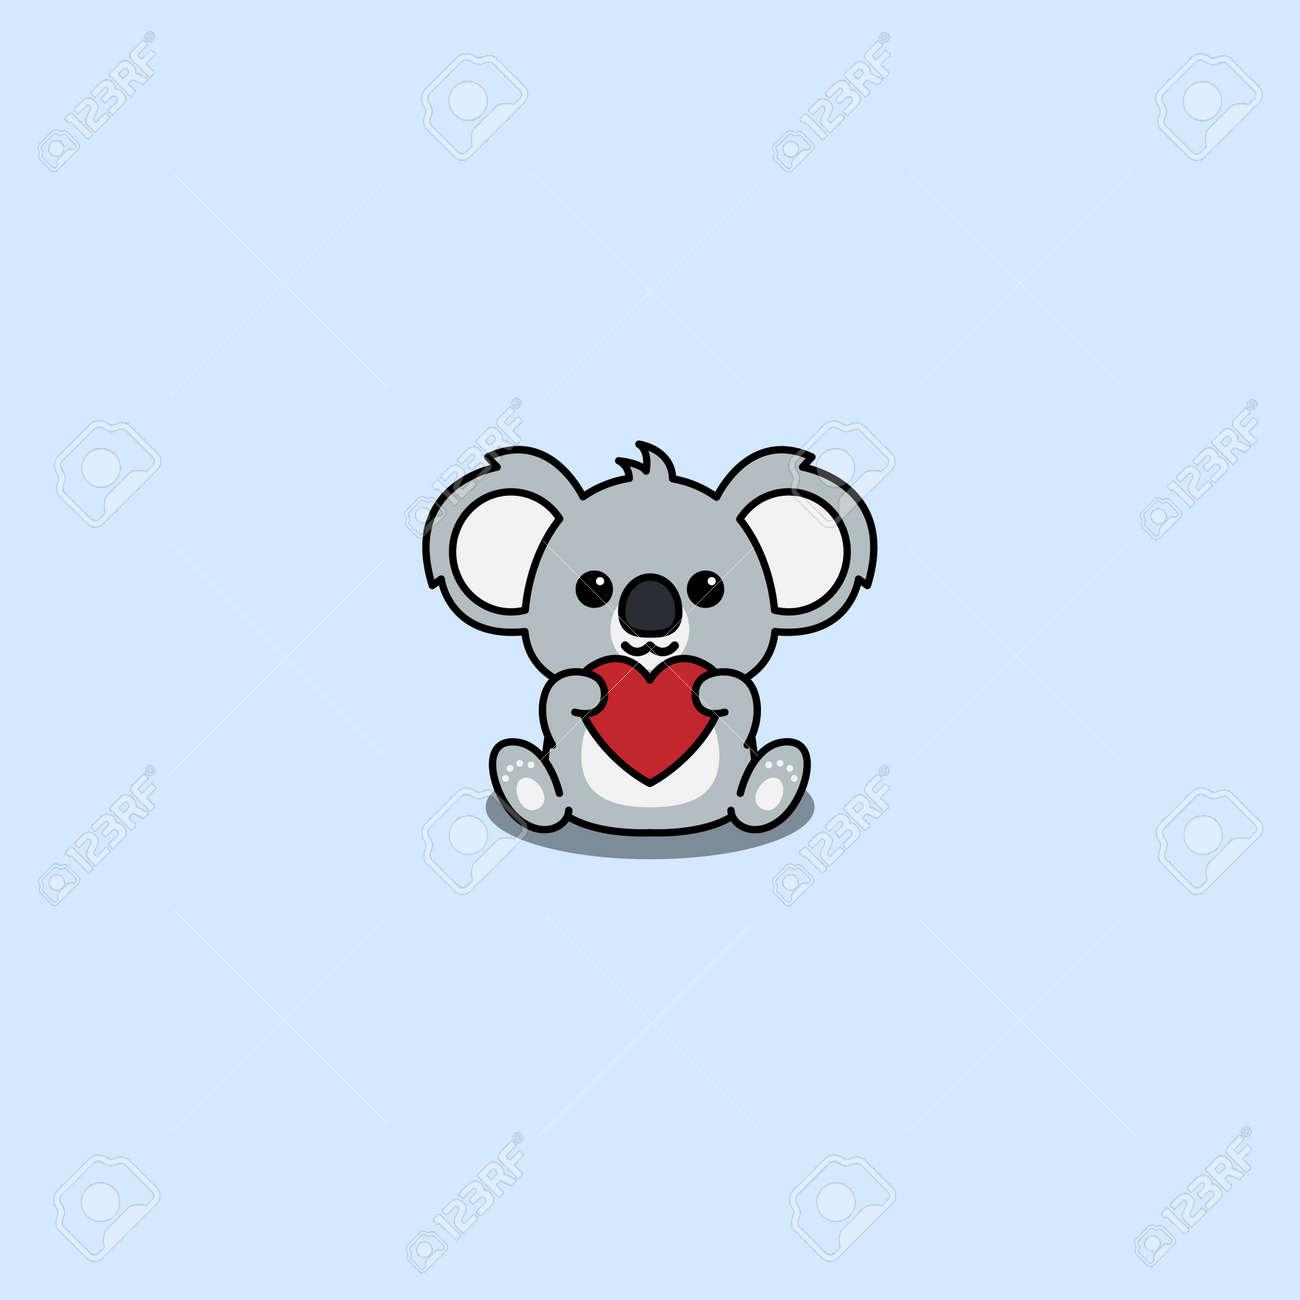 Cute koala holding red heart shaped cartoon, vector illustration - 169153199